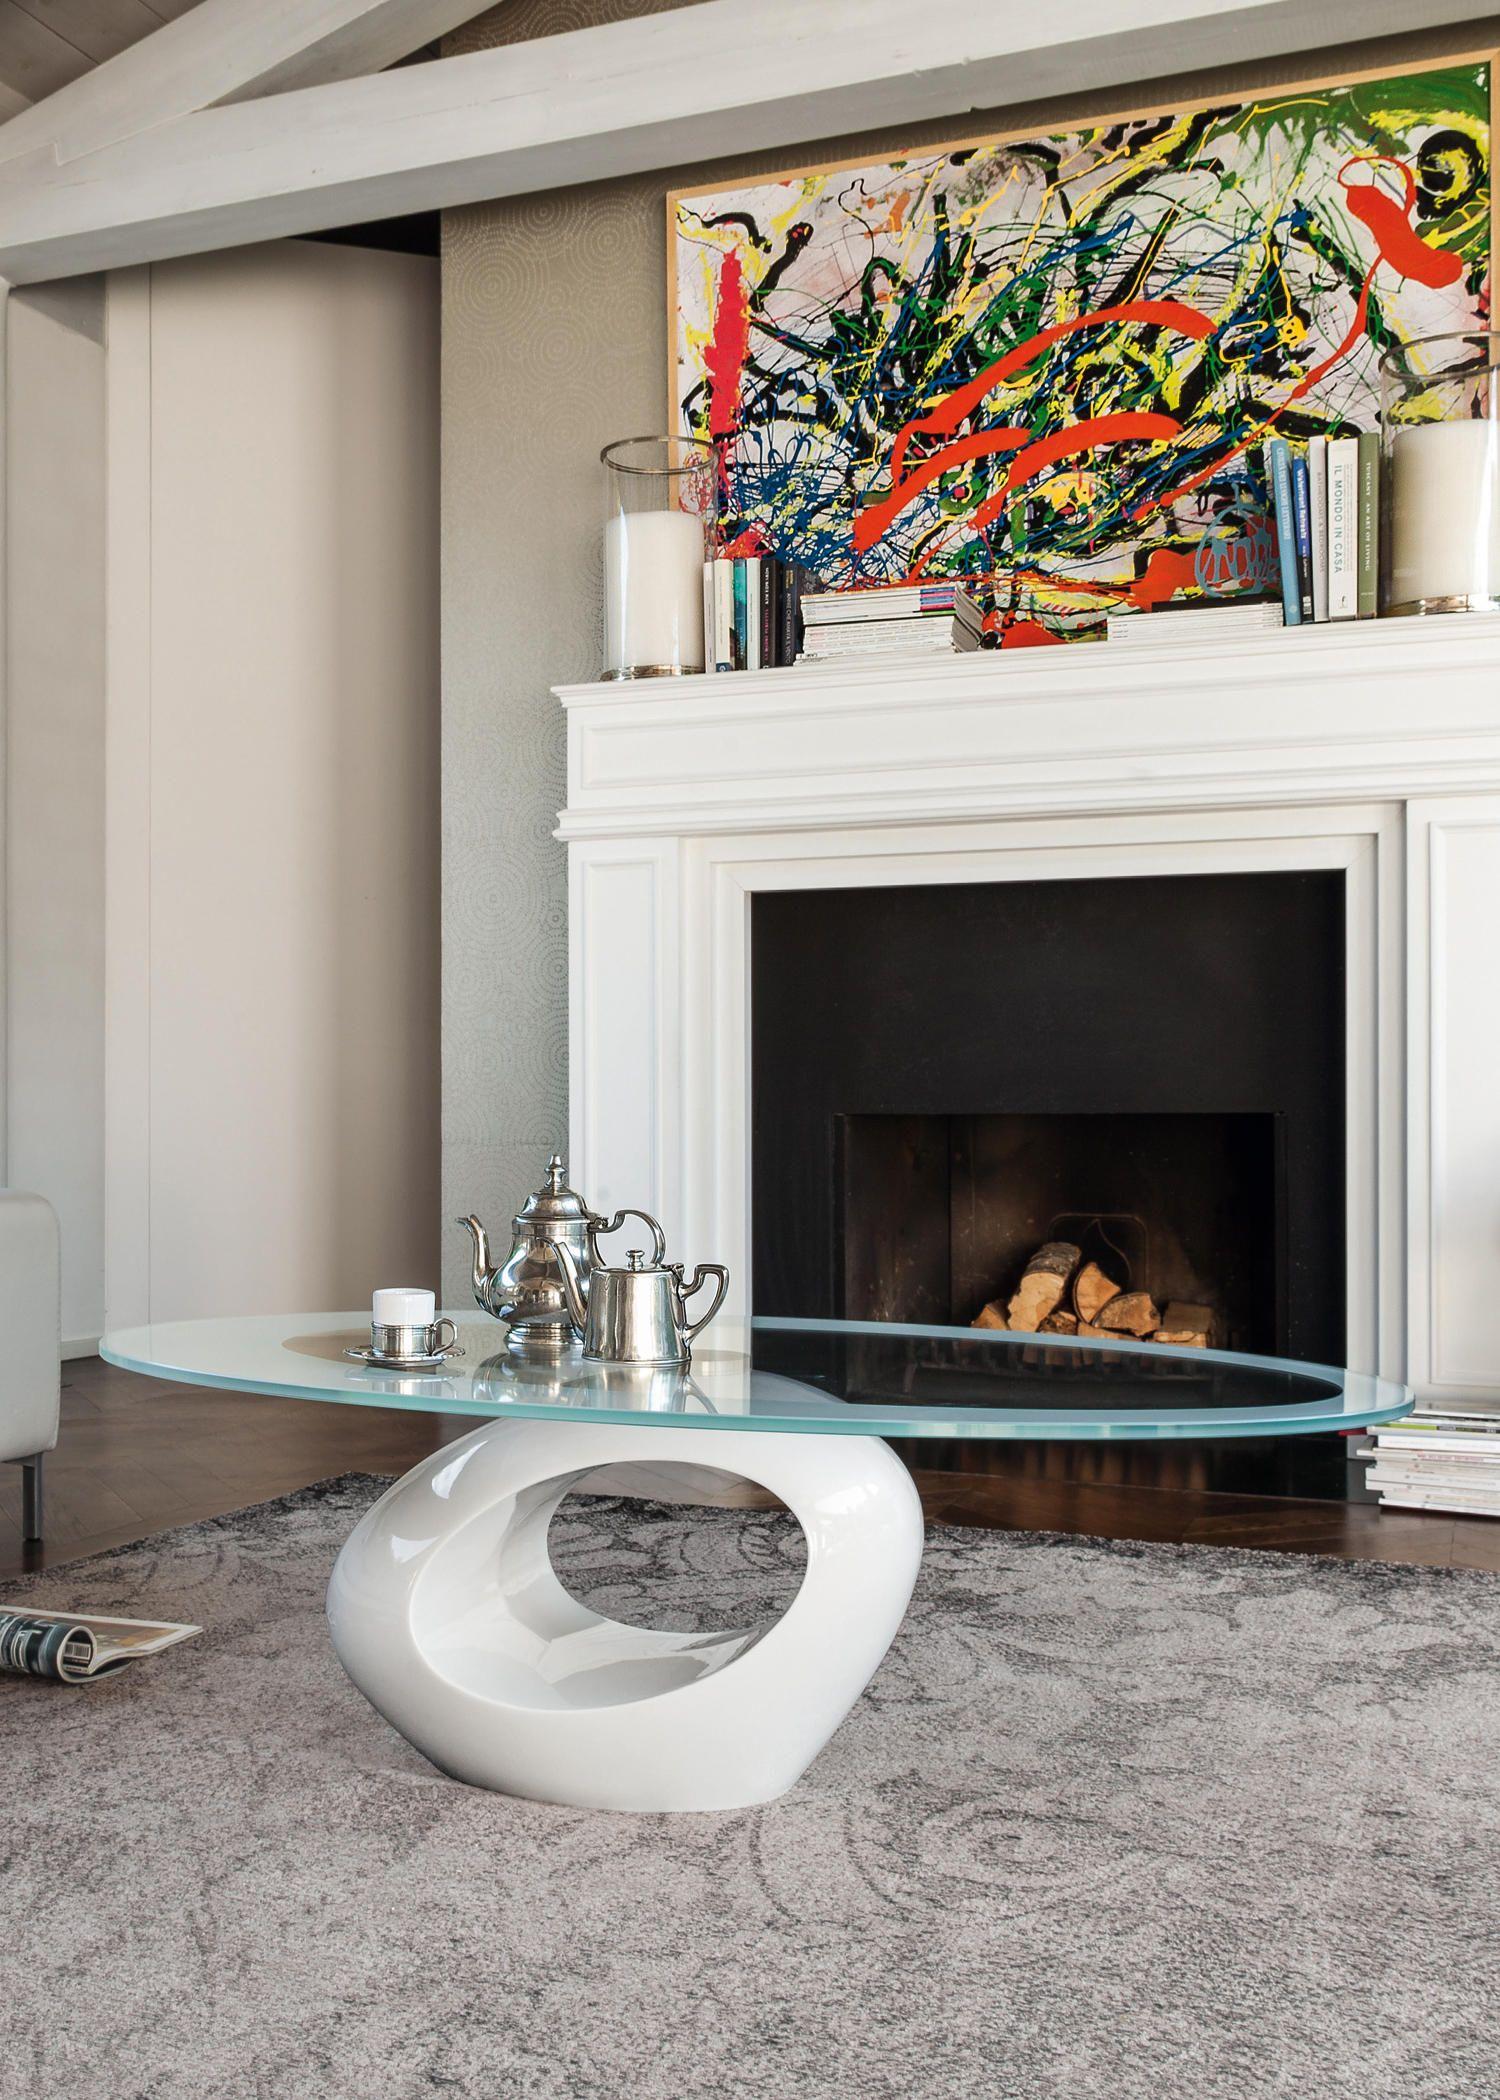 Coffee Table With Base In Lacquered Glossy Black Marble Agglomerate And Top In Tempered Glass With Black Serigraphy L Tavolo Da Soggiorno Marmo Nero Caminetto [ 2100 x 1500 Pixel ]